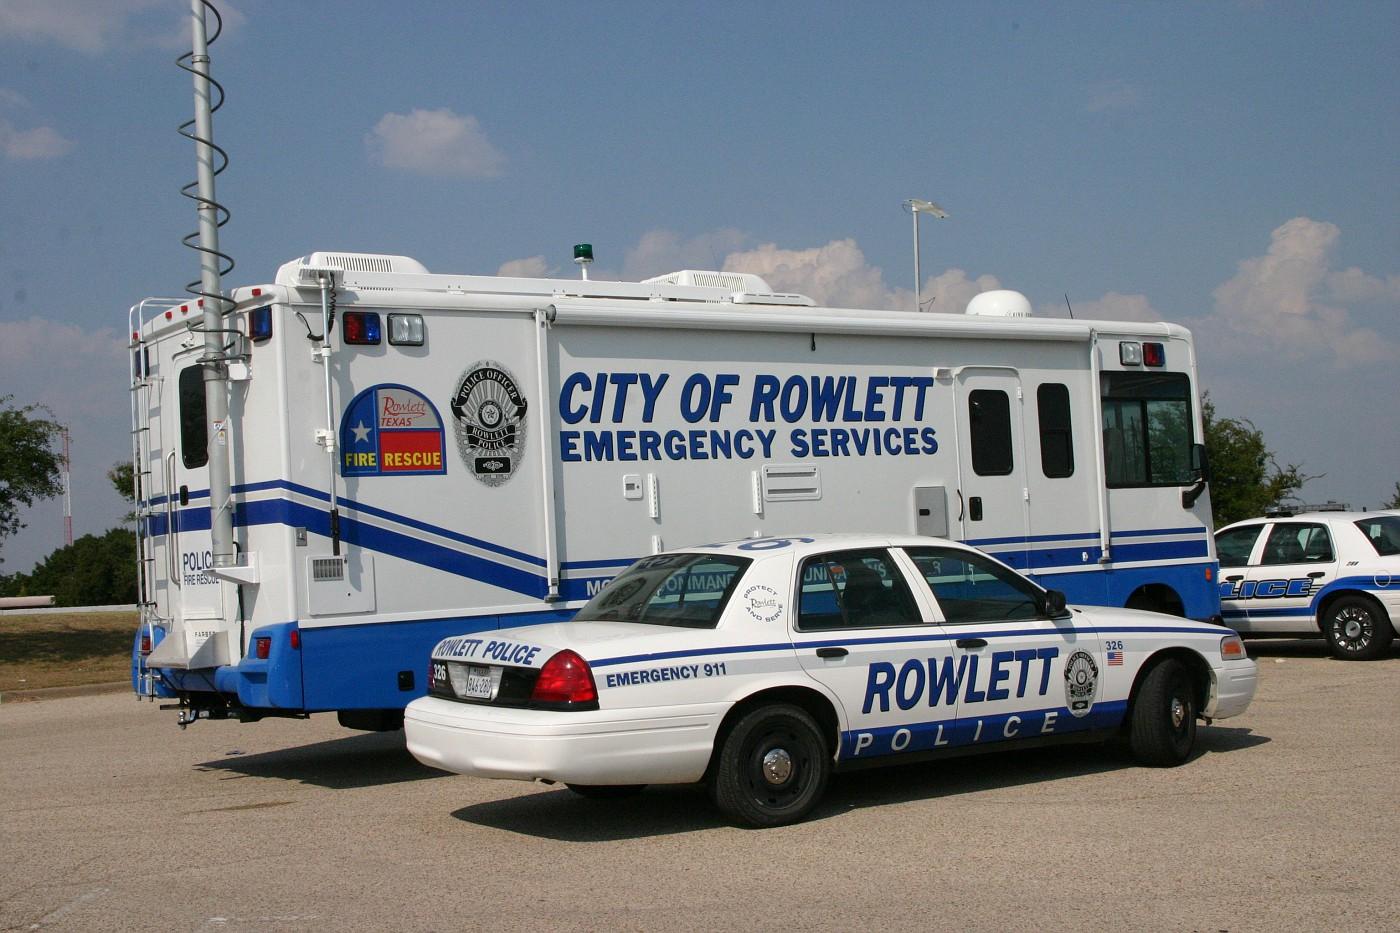 Rowlett Police